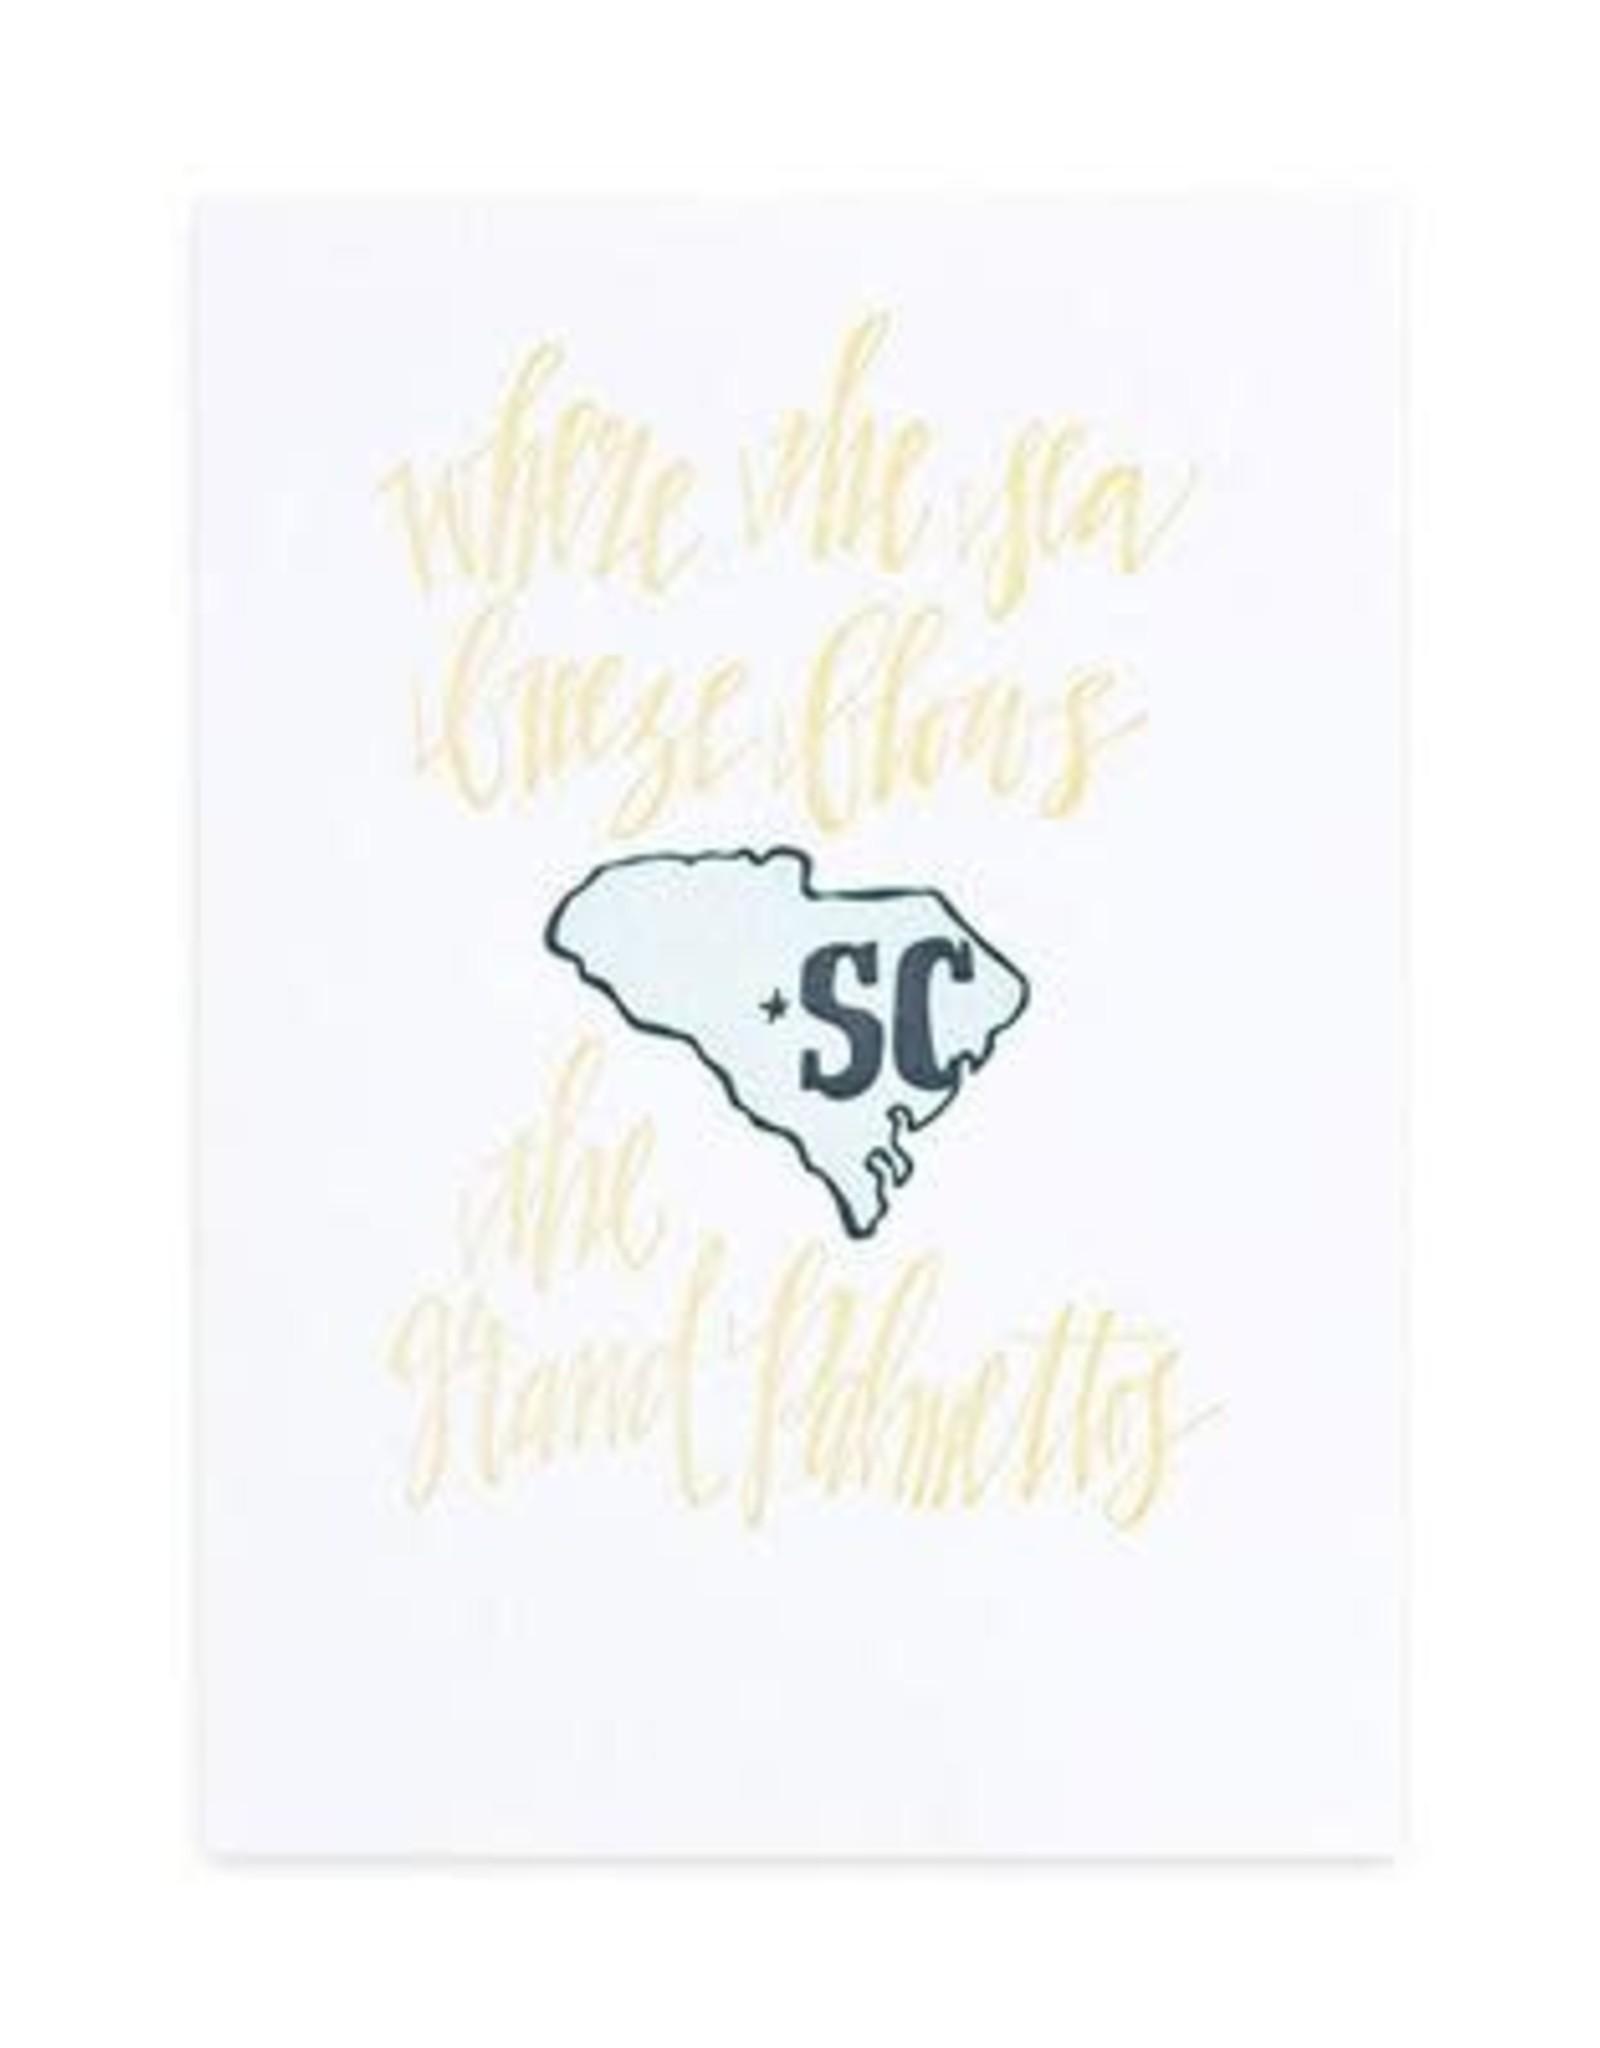 1Canoe2 Letterpress South Carolina Letterpress Print